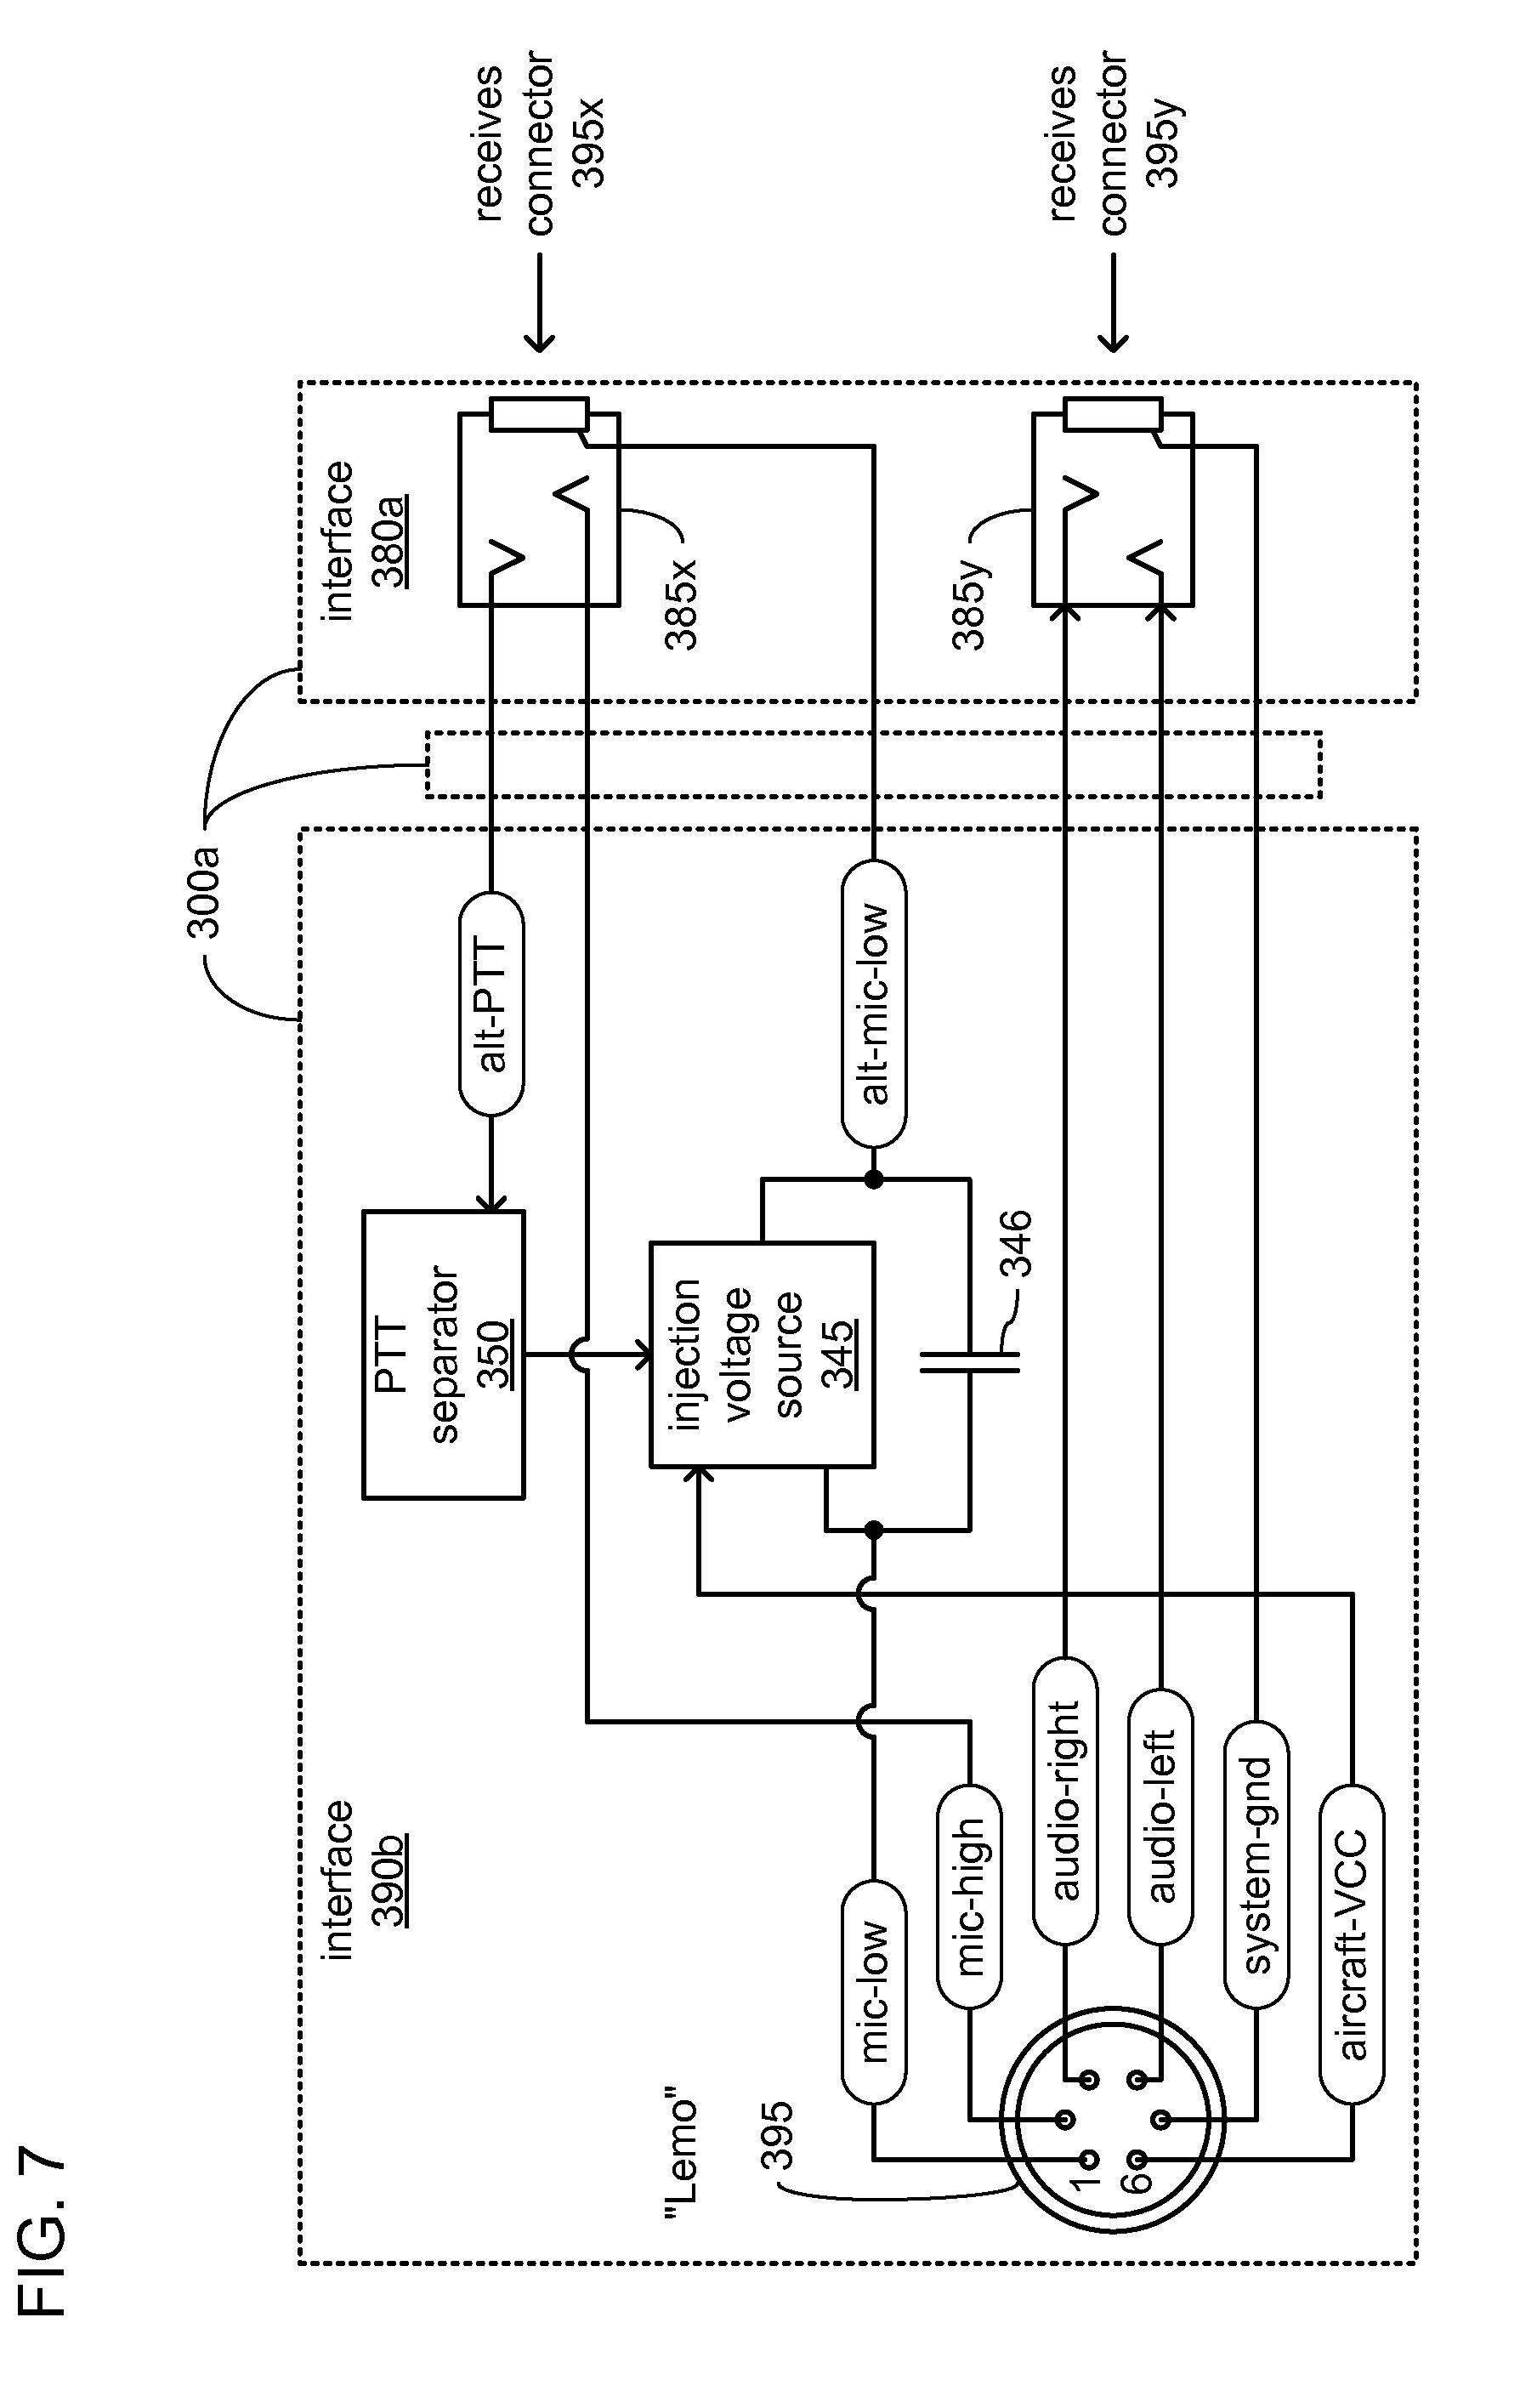 Aircraft Headset Wiring Diagram